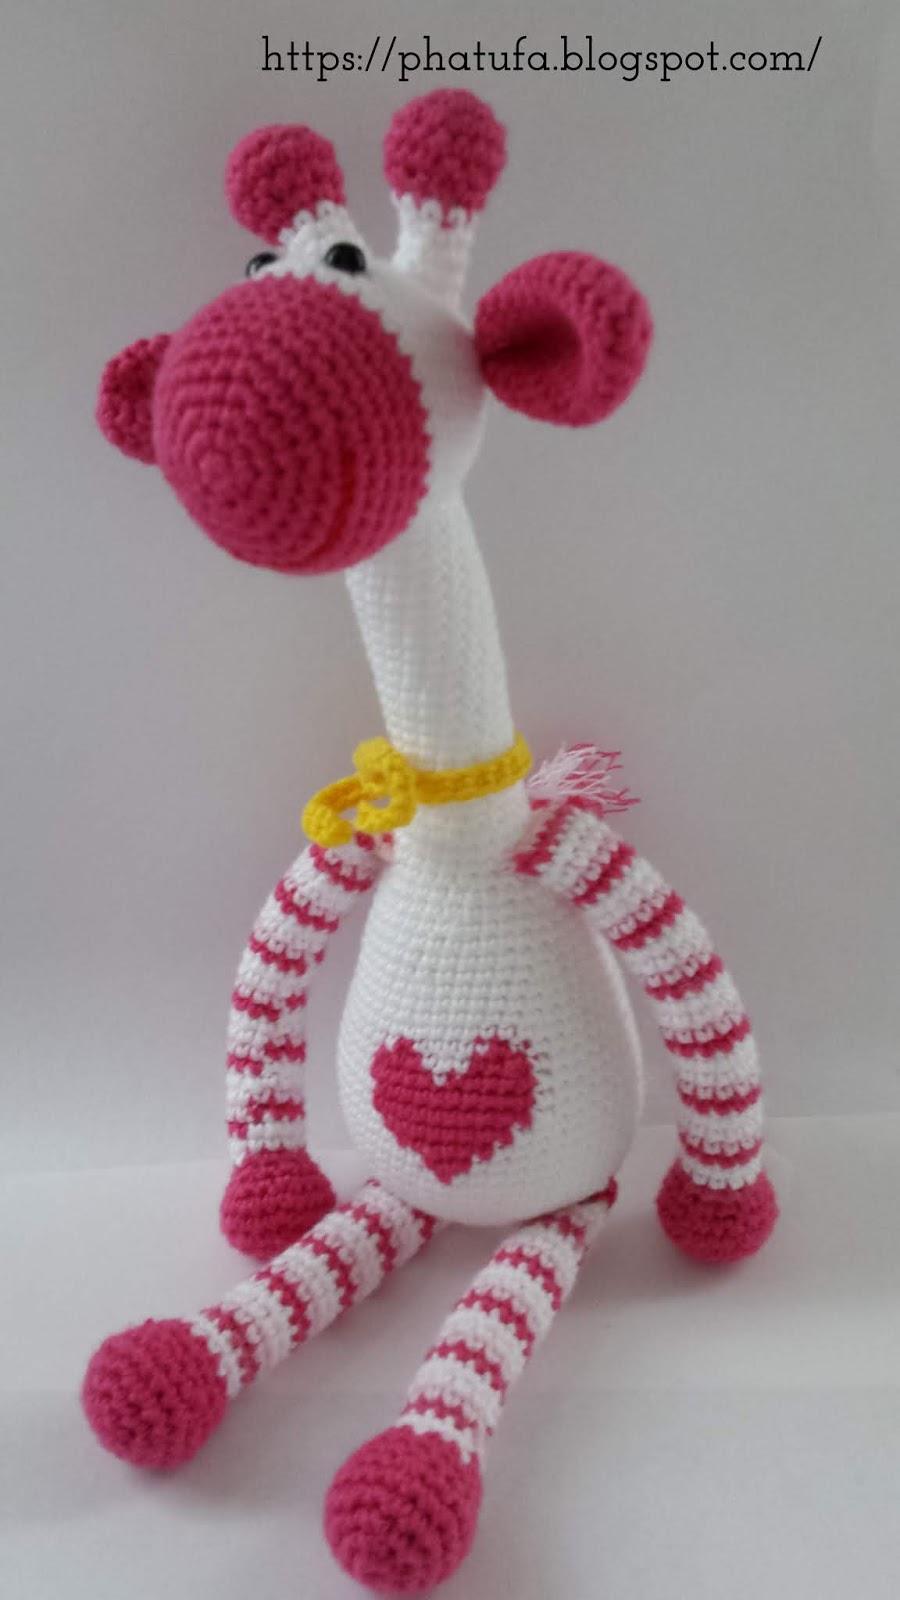 Hearty Giraffe amigurumi pattern - Amigurumi Today | 1600x900